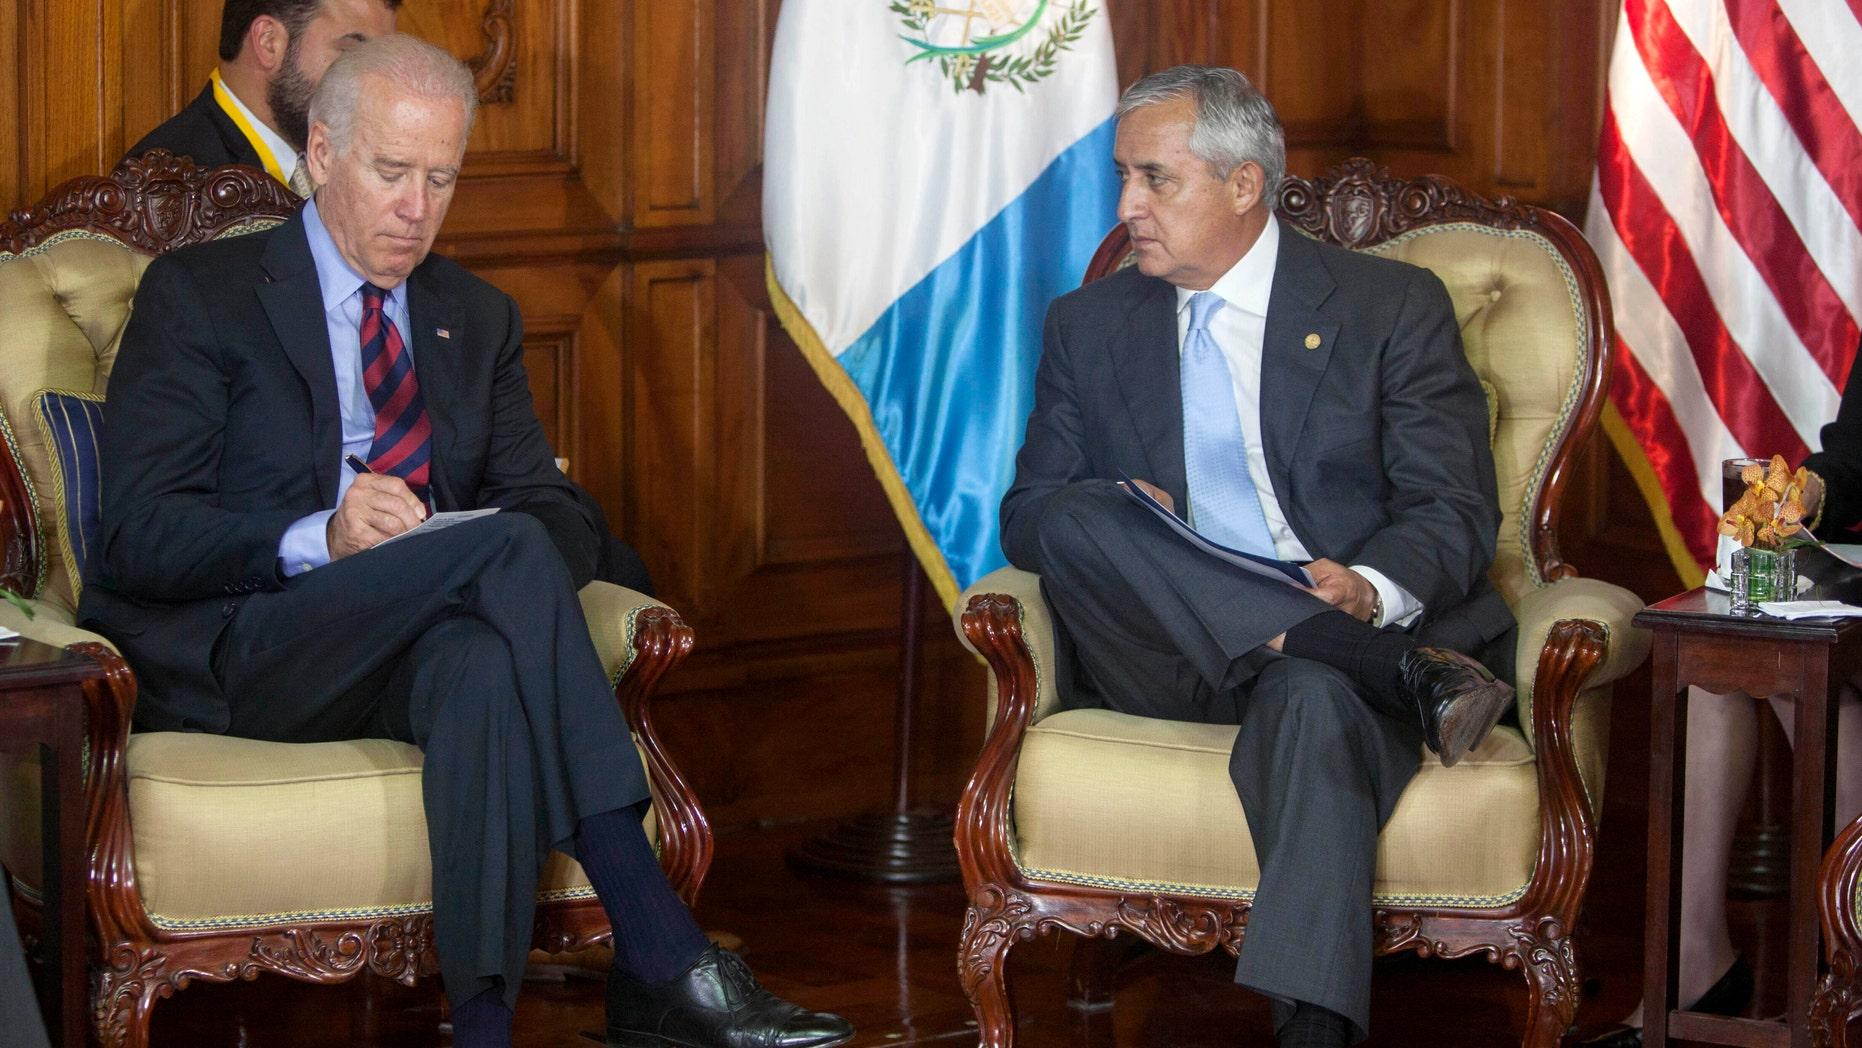 U.S. Vice President Joe Biden and Guatemala's President Otto Perez Molina in Guatemala City, Friday, June 20, 2014.